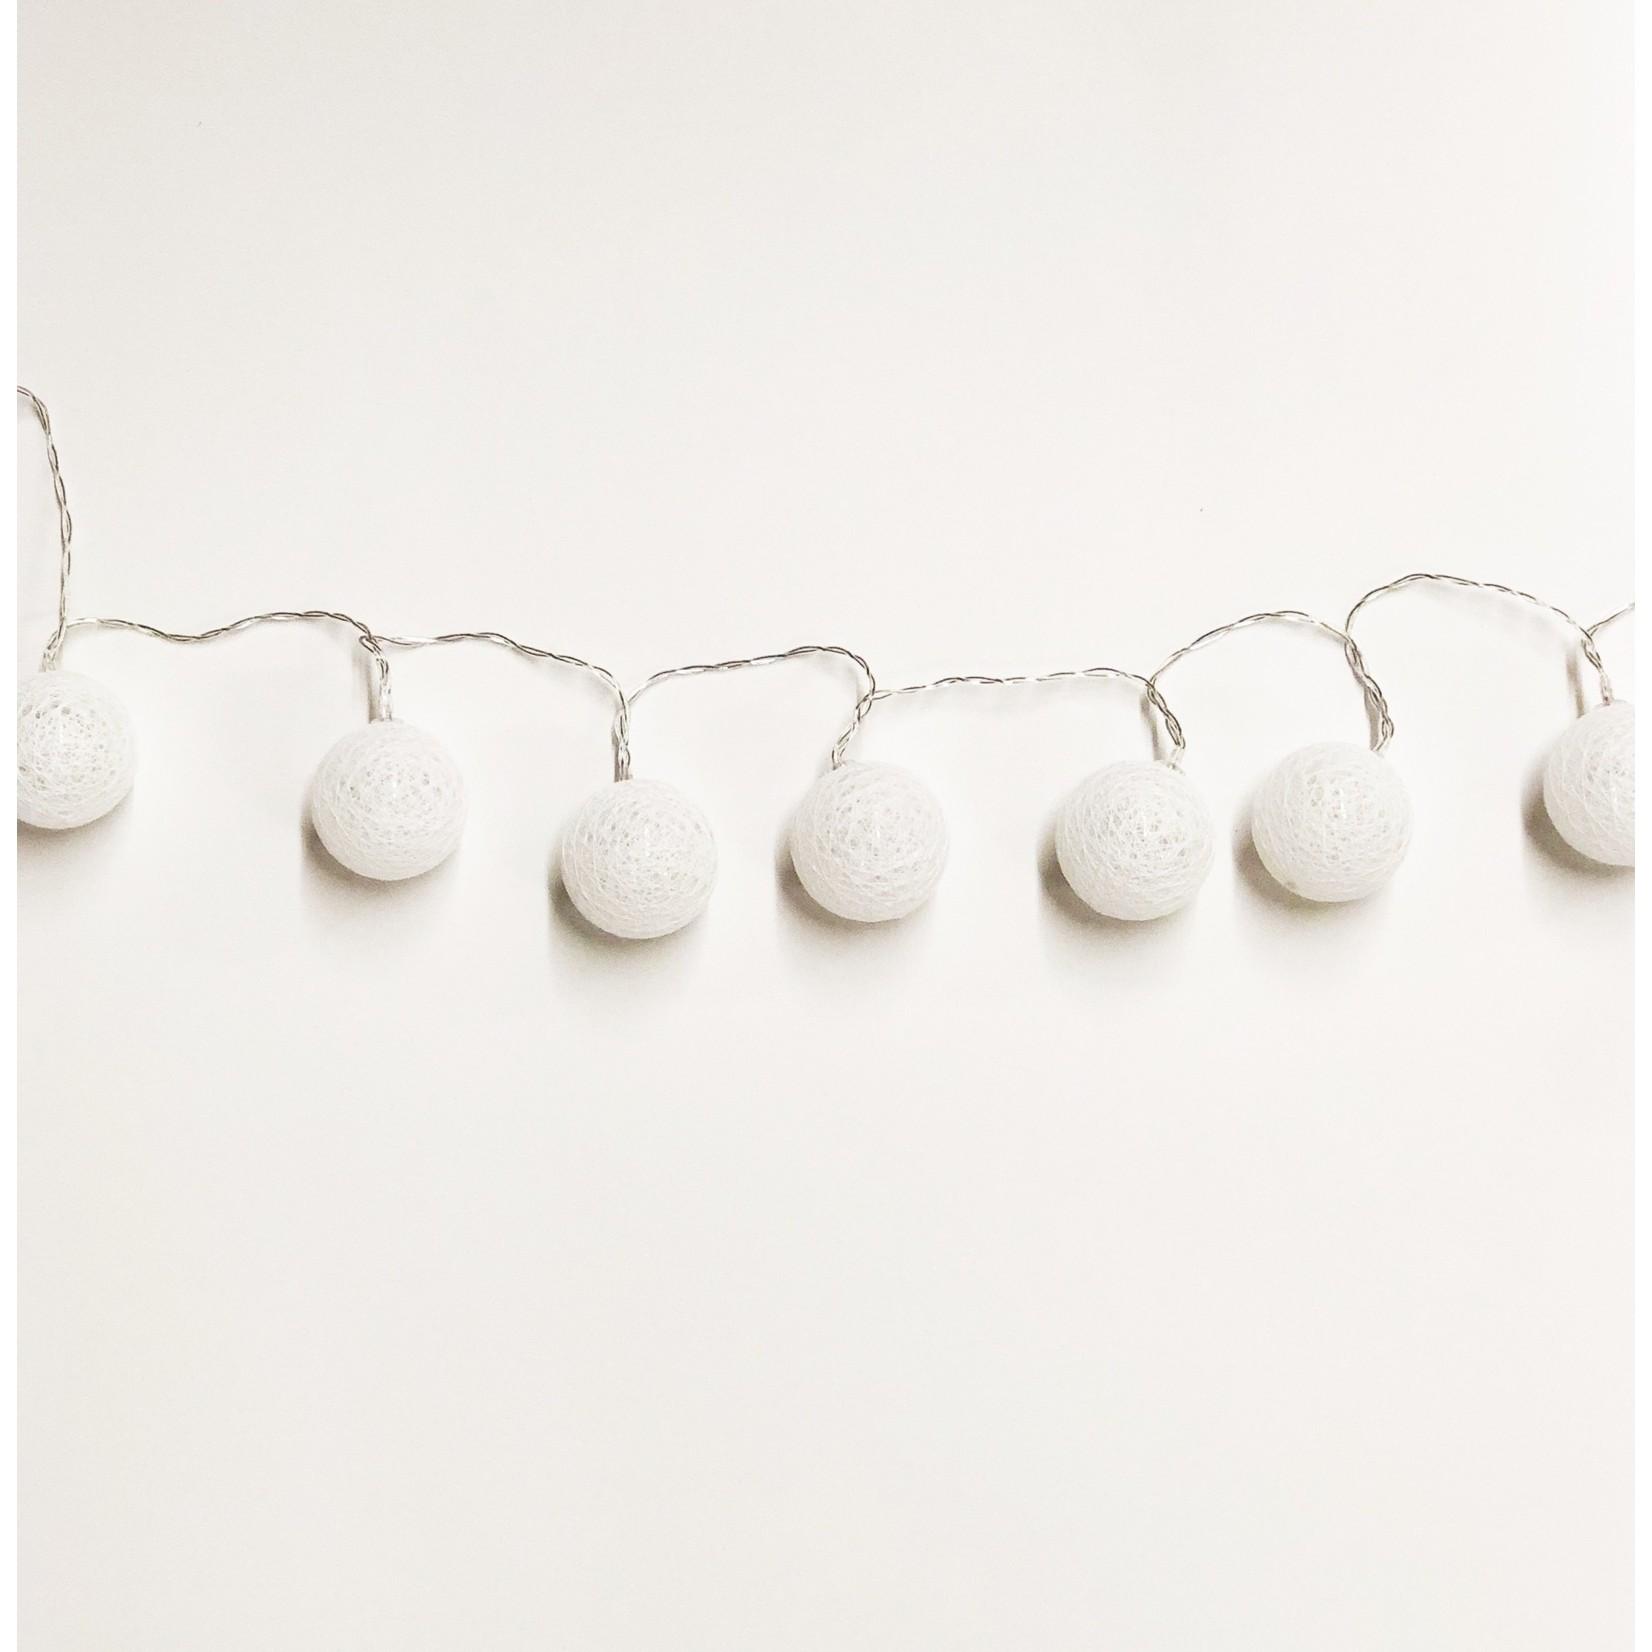 Cotton Ball LED String Lights